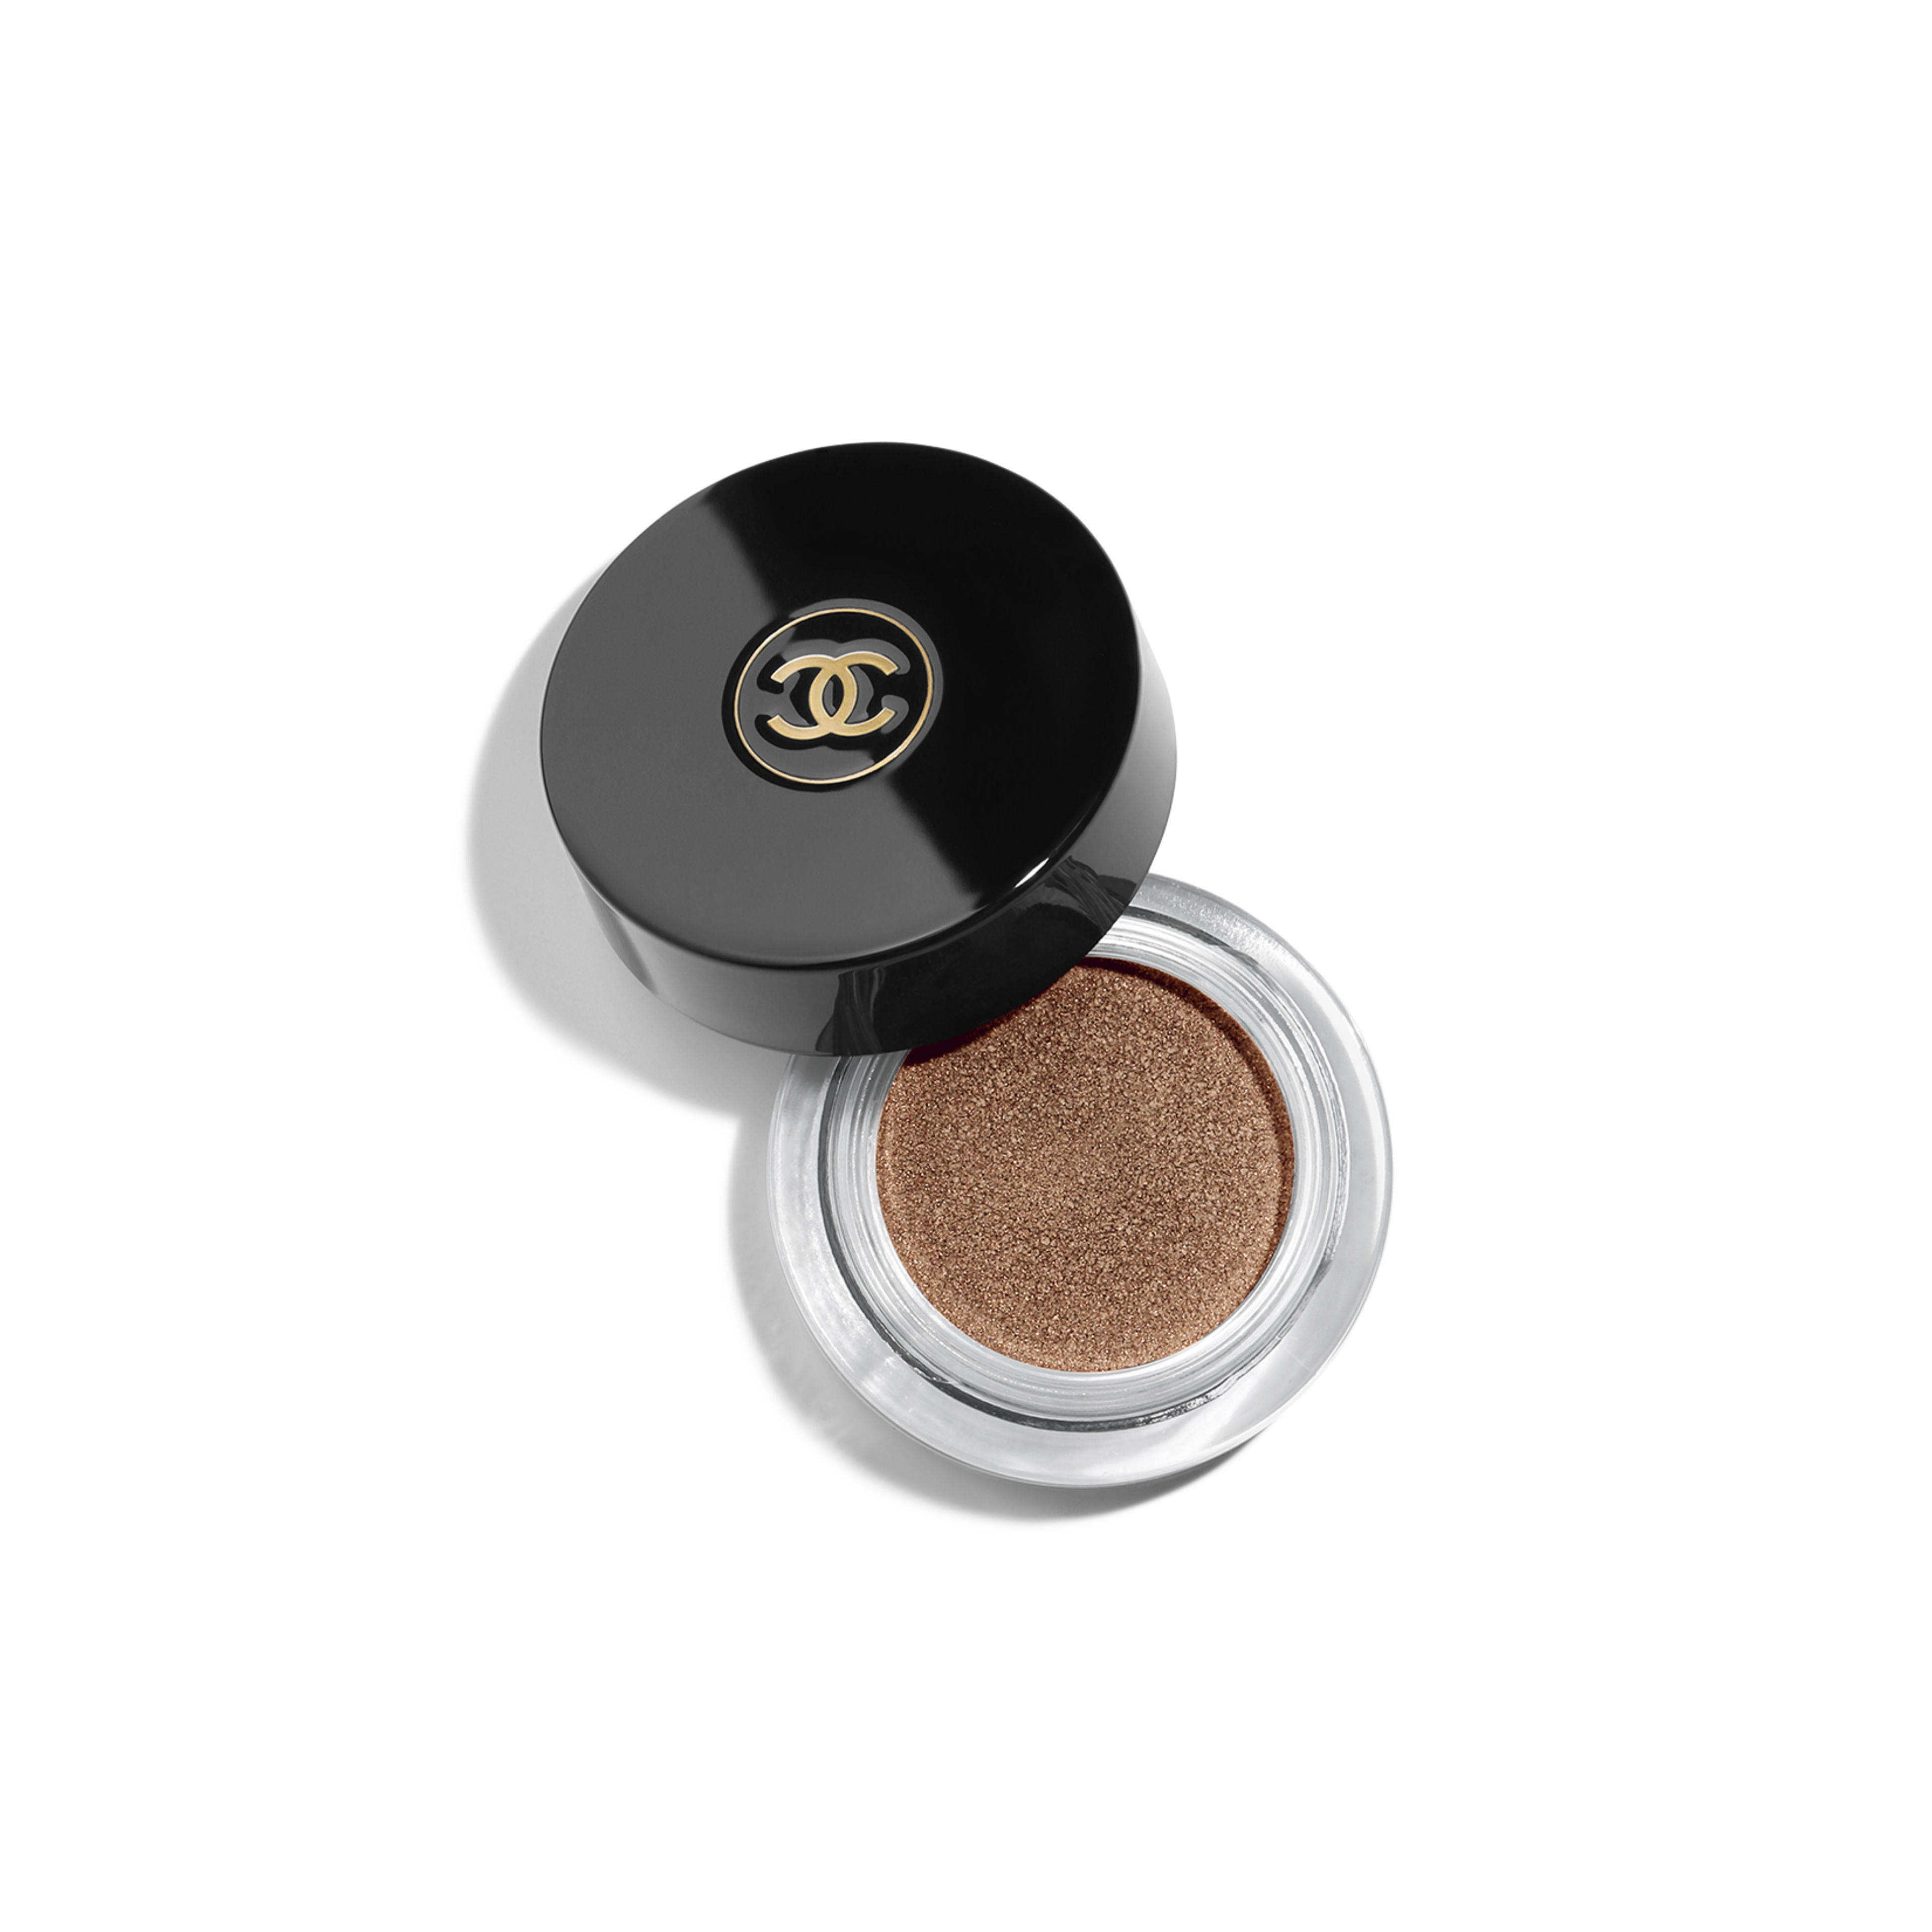 OMBRE PREMIÈRE - makeup - 0.14OZ. -                                                            default view - see full sized version